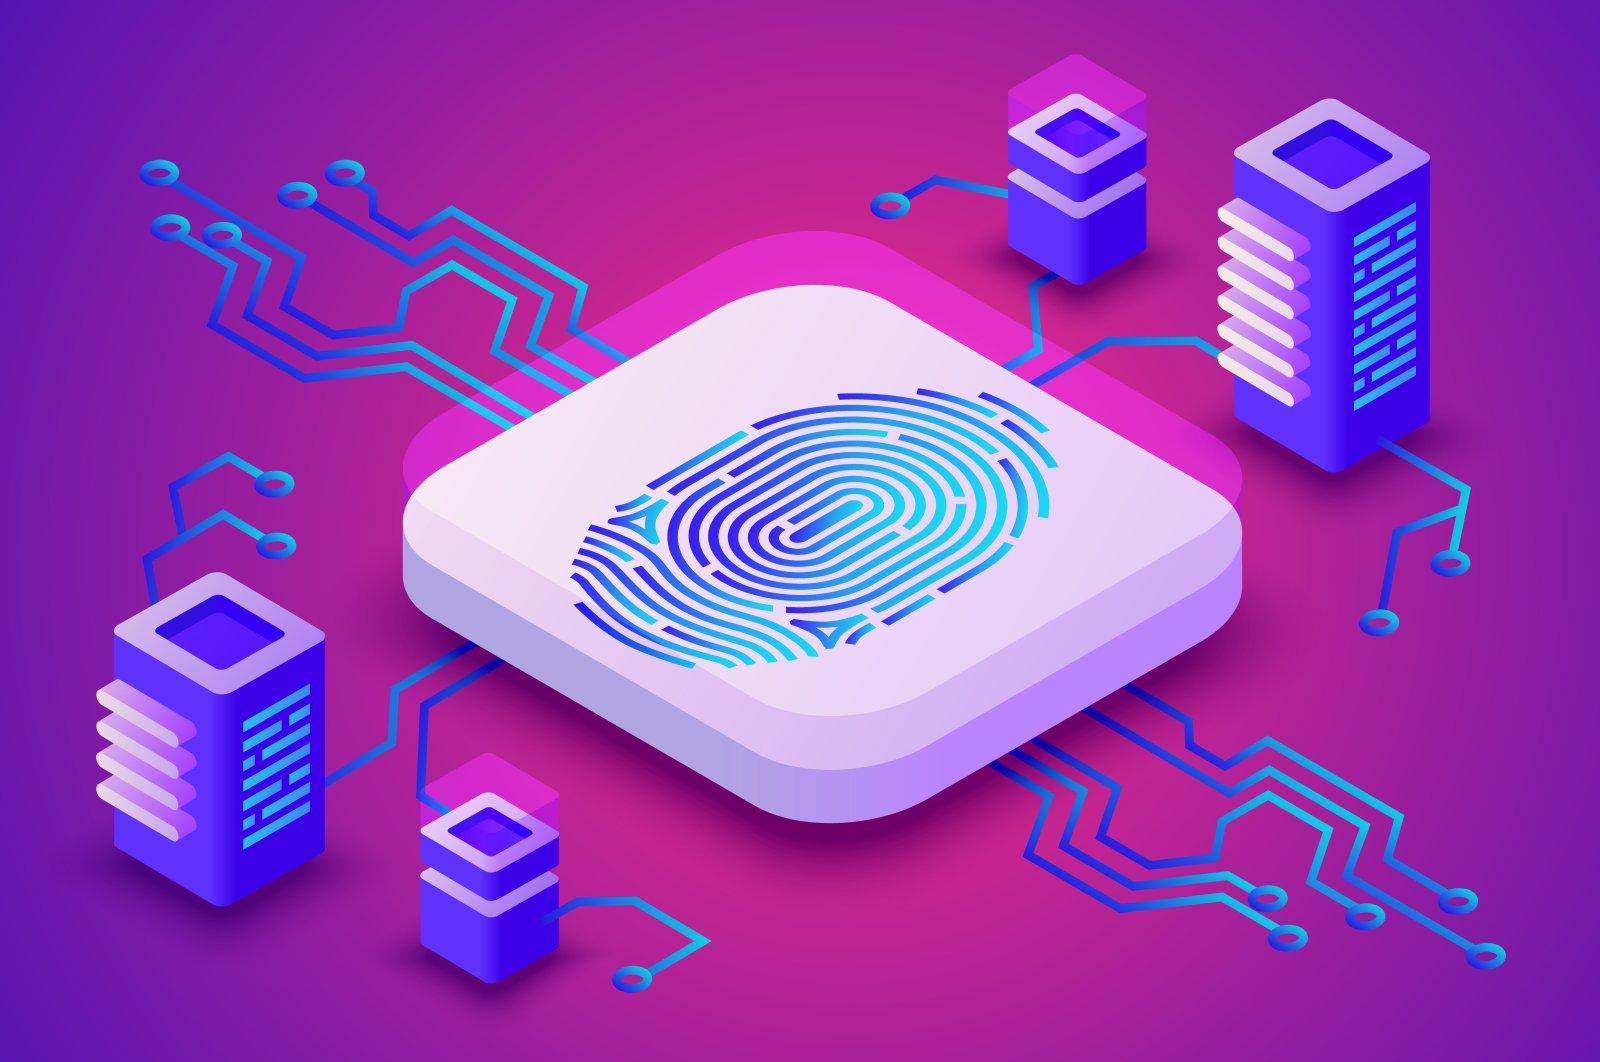 Biometrics blockchain technology vector illustration.